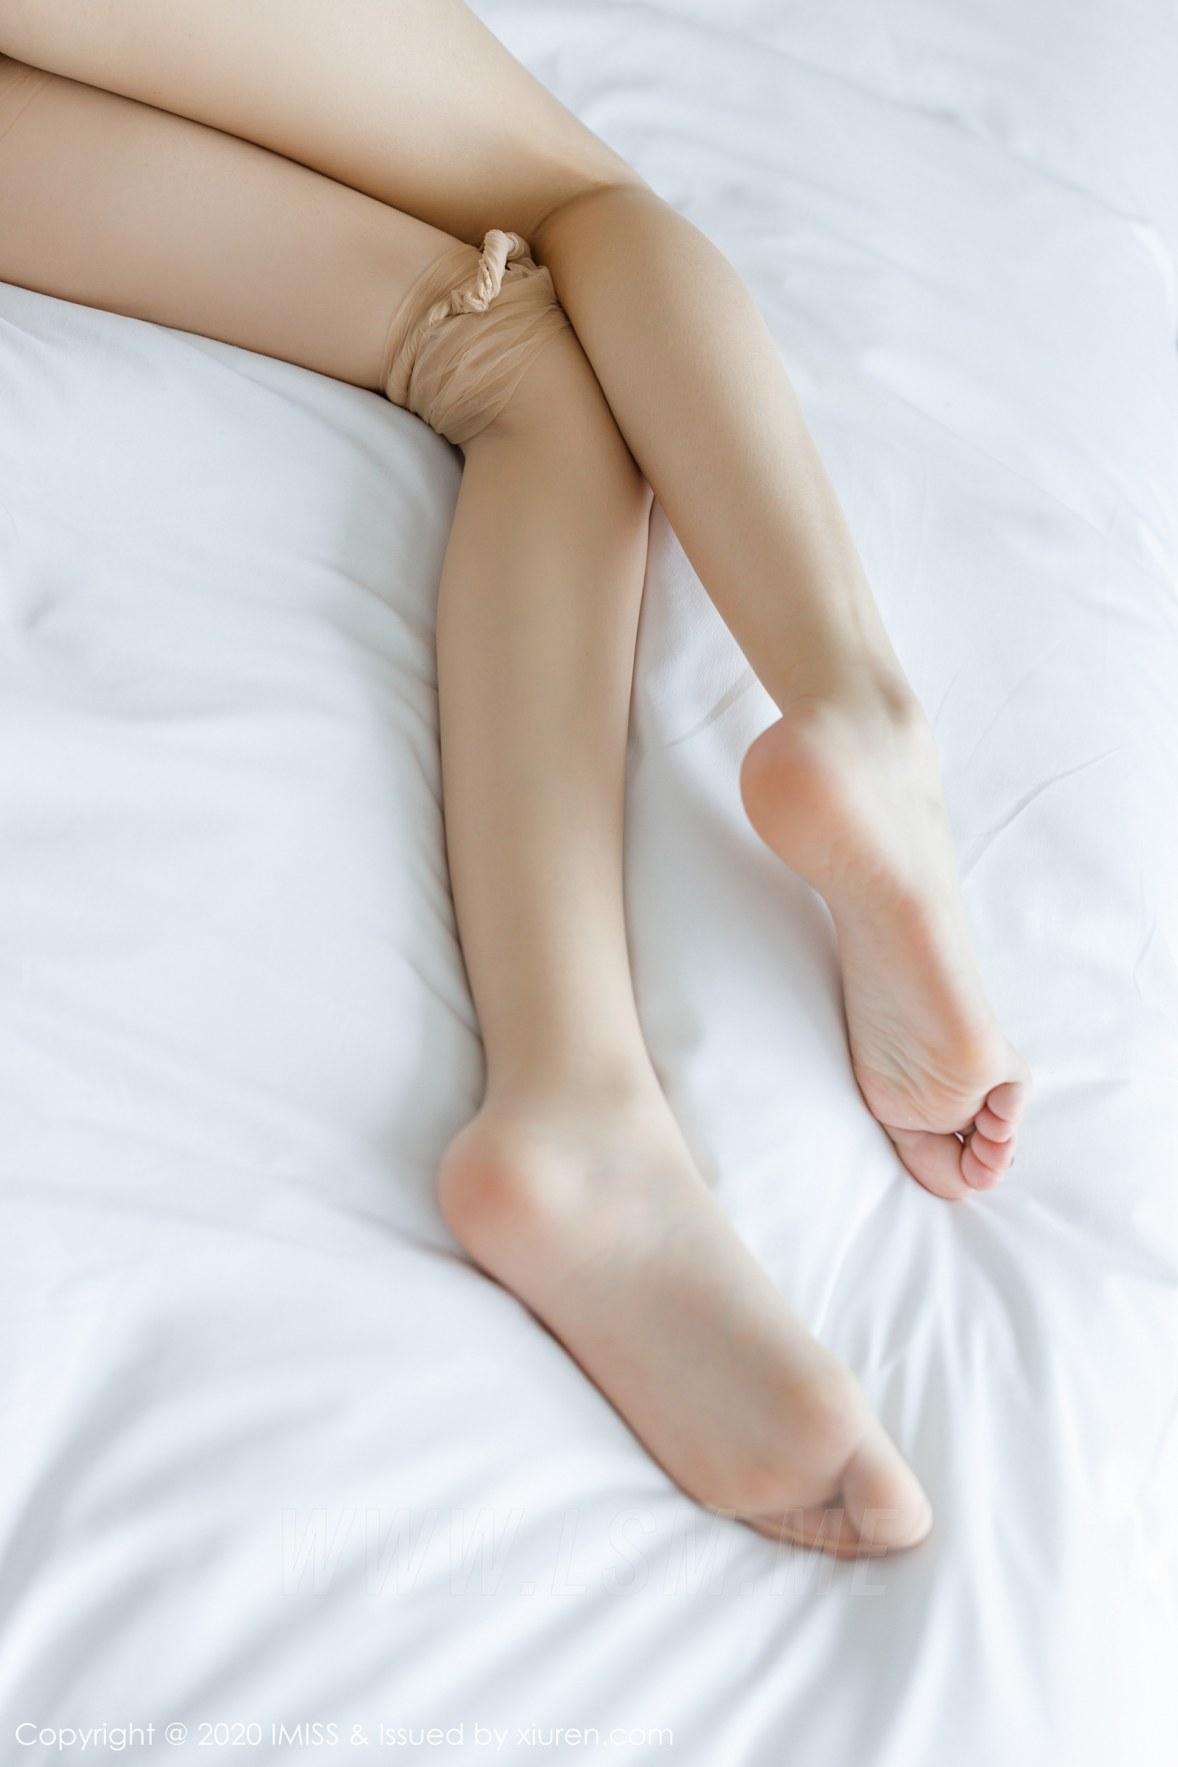 454 056 z7q 3600 5400 - IMiss 爱蜜社 Vol.454 丝袜美腿写真 九月生__ - 爱蜜社 -【免费在线写真】【丽人丝语】